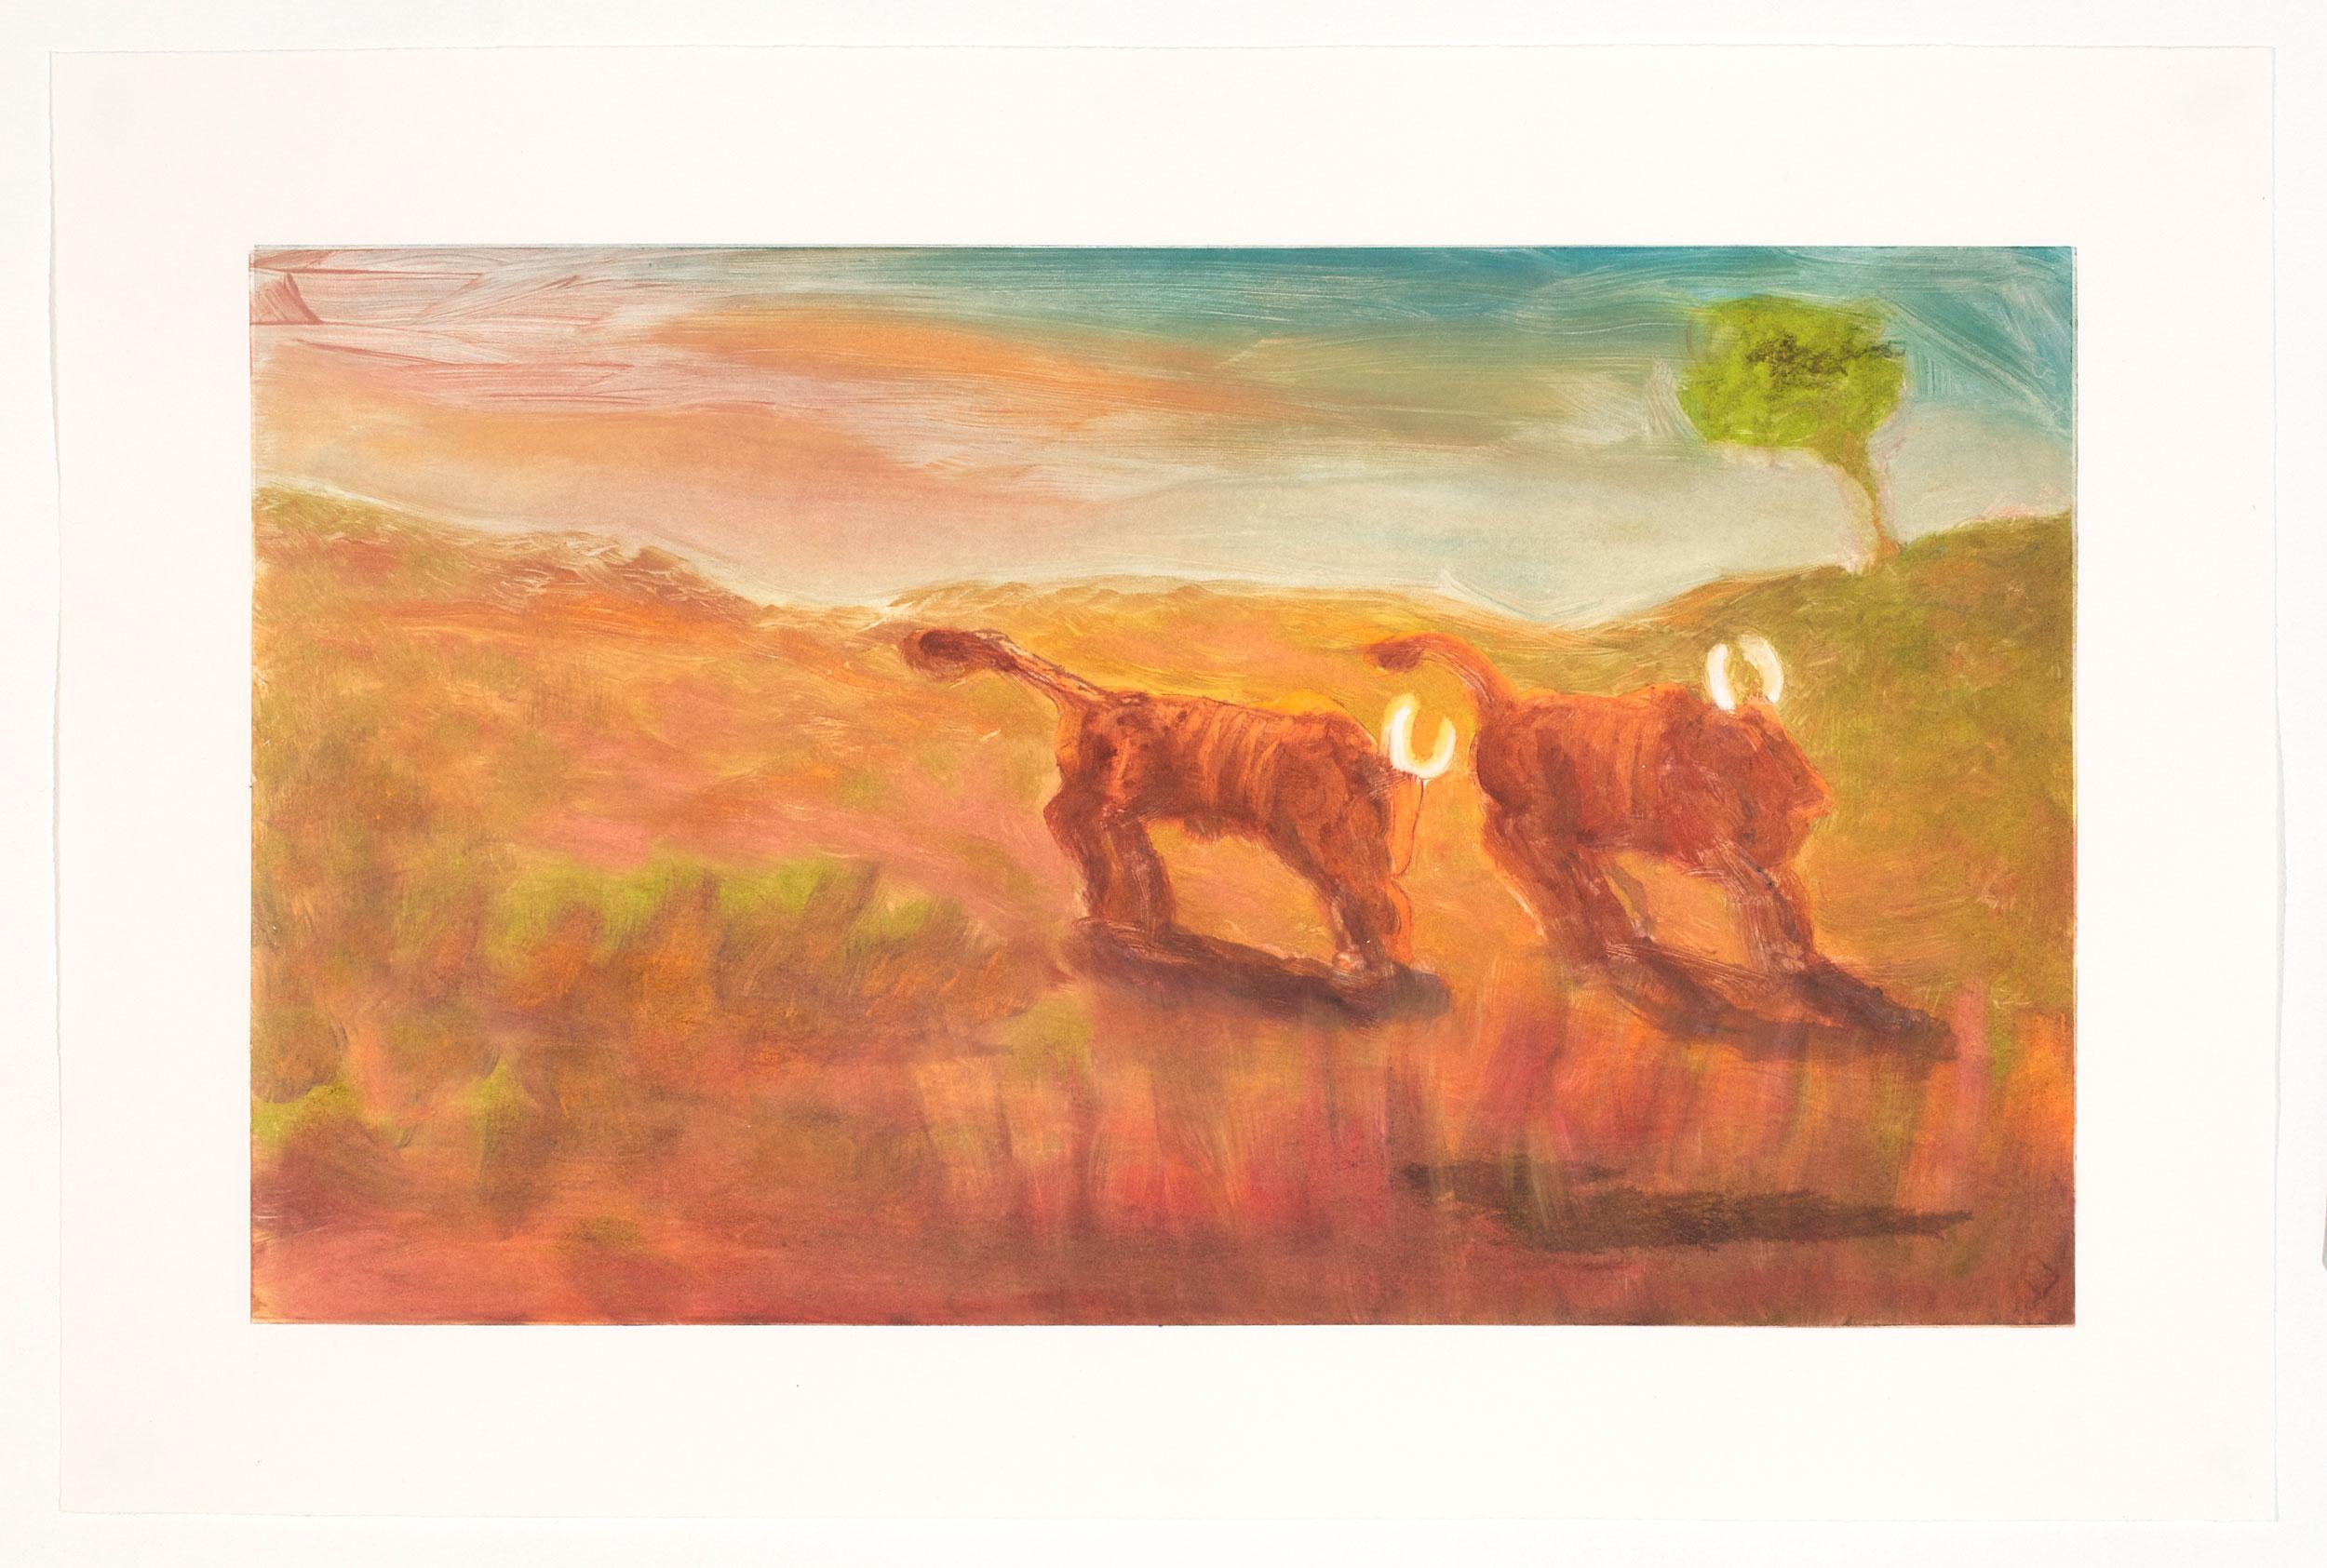 Bangikaya Maqoqa Happy-brothers-Prints Selling R5,000.00 - R10,000.00